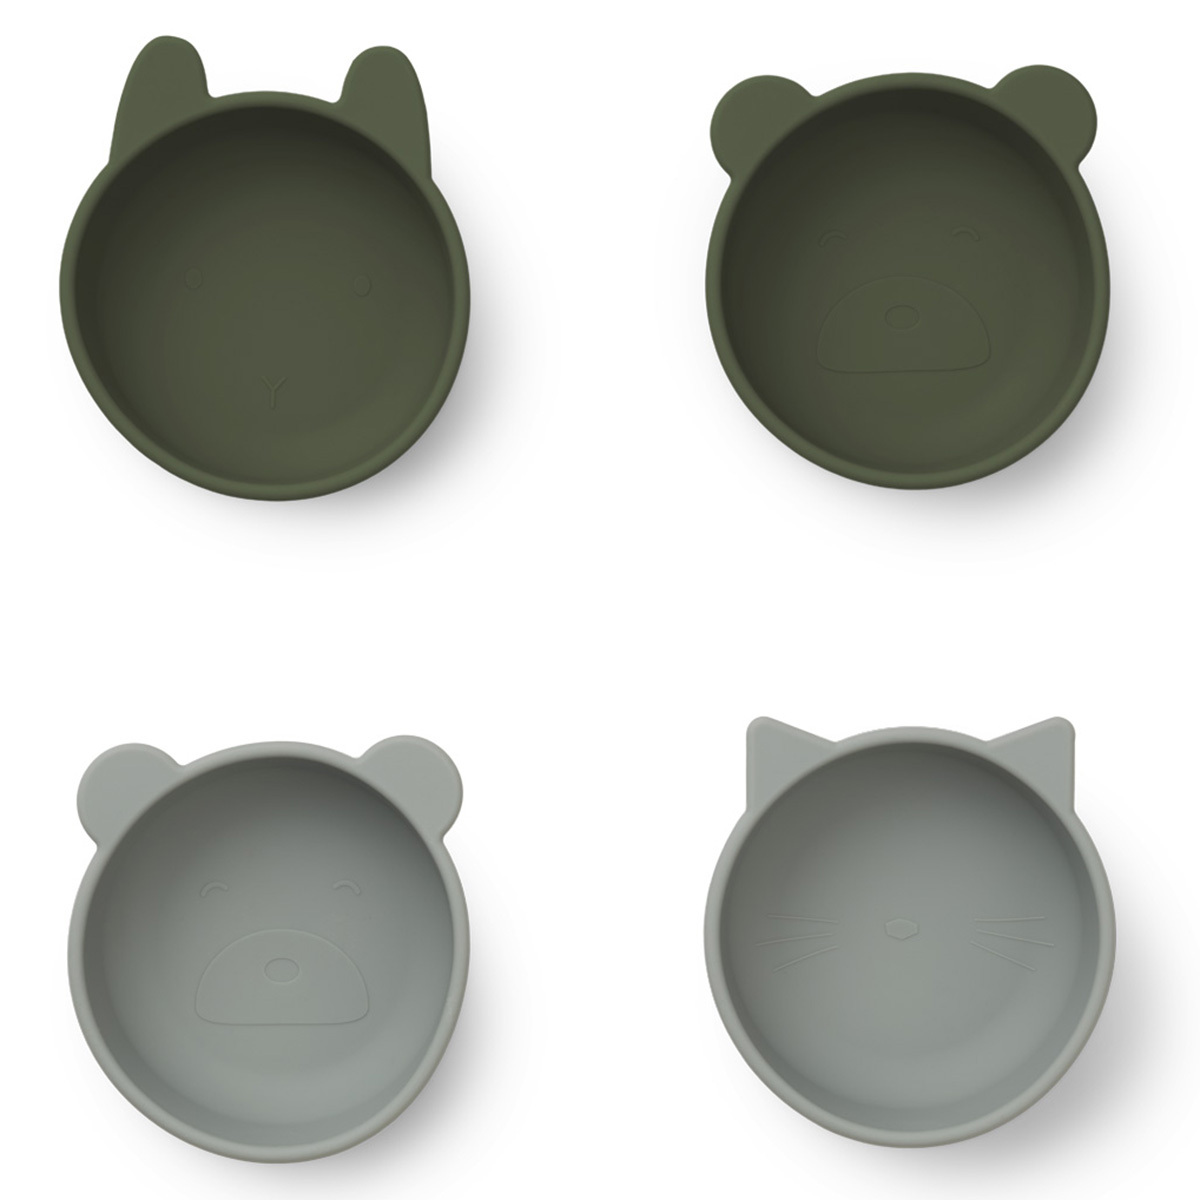 Vaisselle & Couvert Lot de 4 Bols en Silicone Iggy - Hunter Green Mix Lot de 4 Bols en Silicone Iggy - Hunter Green Mix